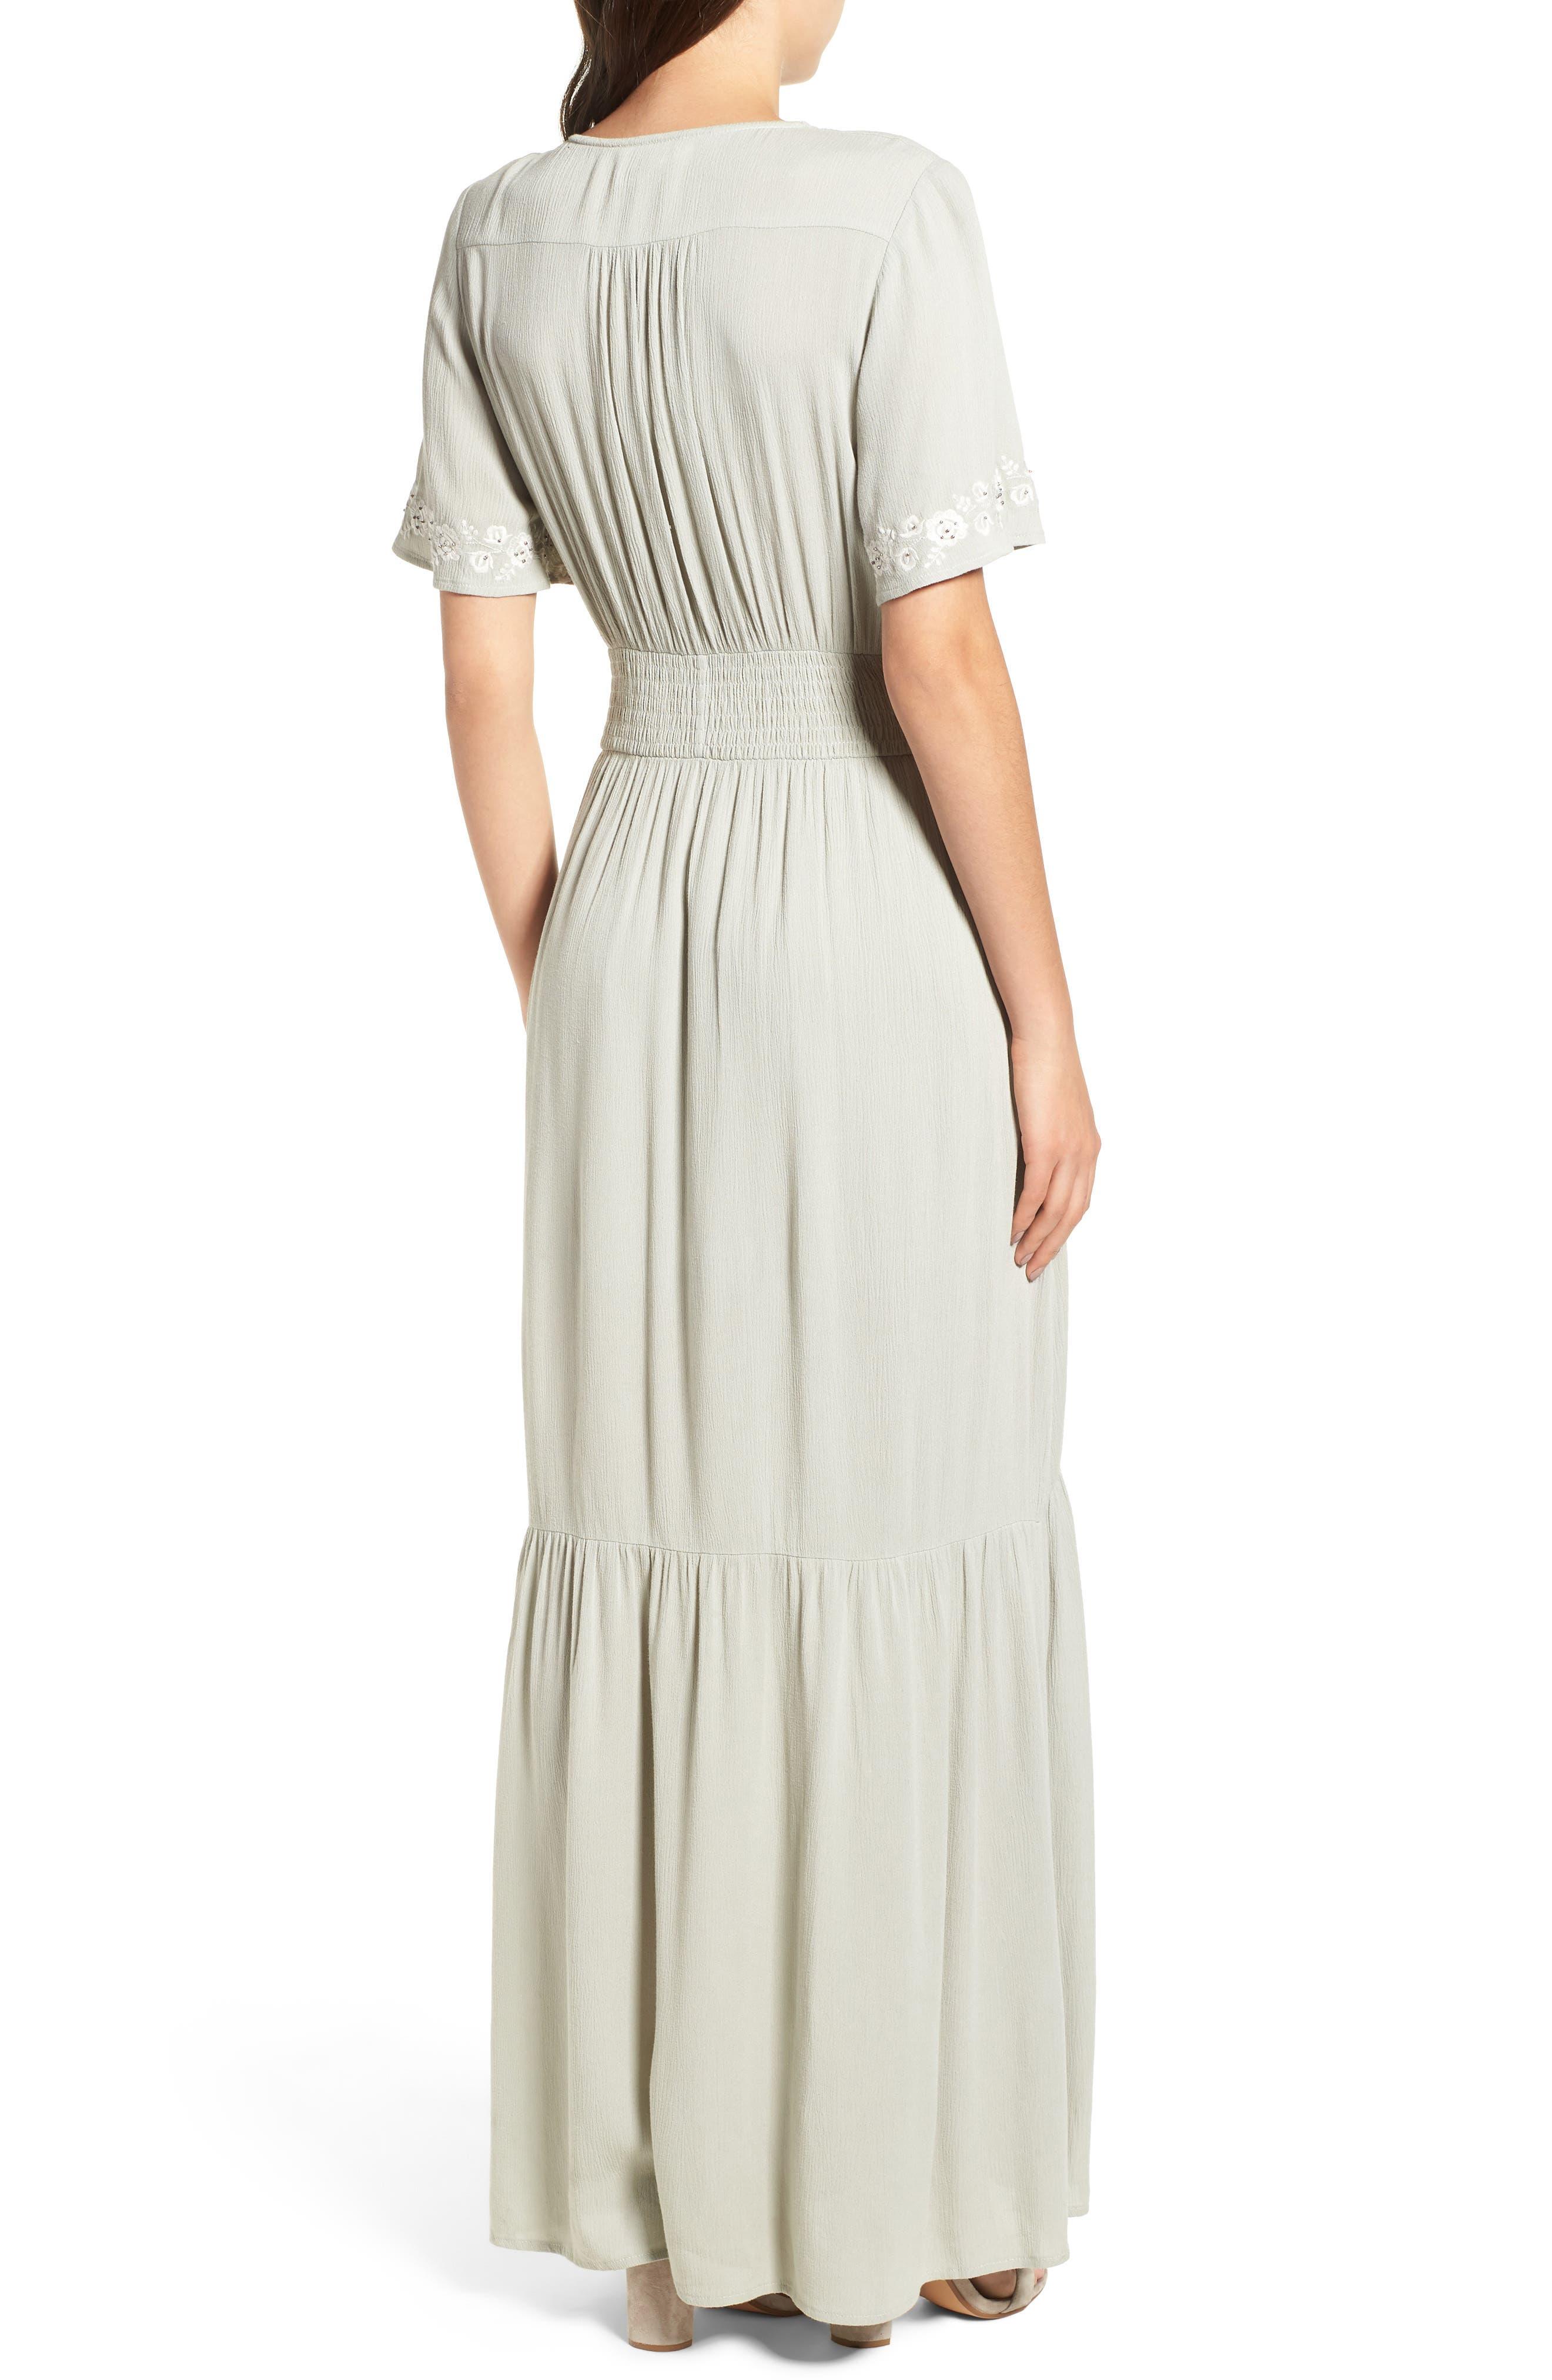 Athena Embroidered Maxi Dress,                             Alternate thumbnail 3, color,                             Sage